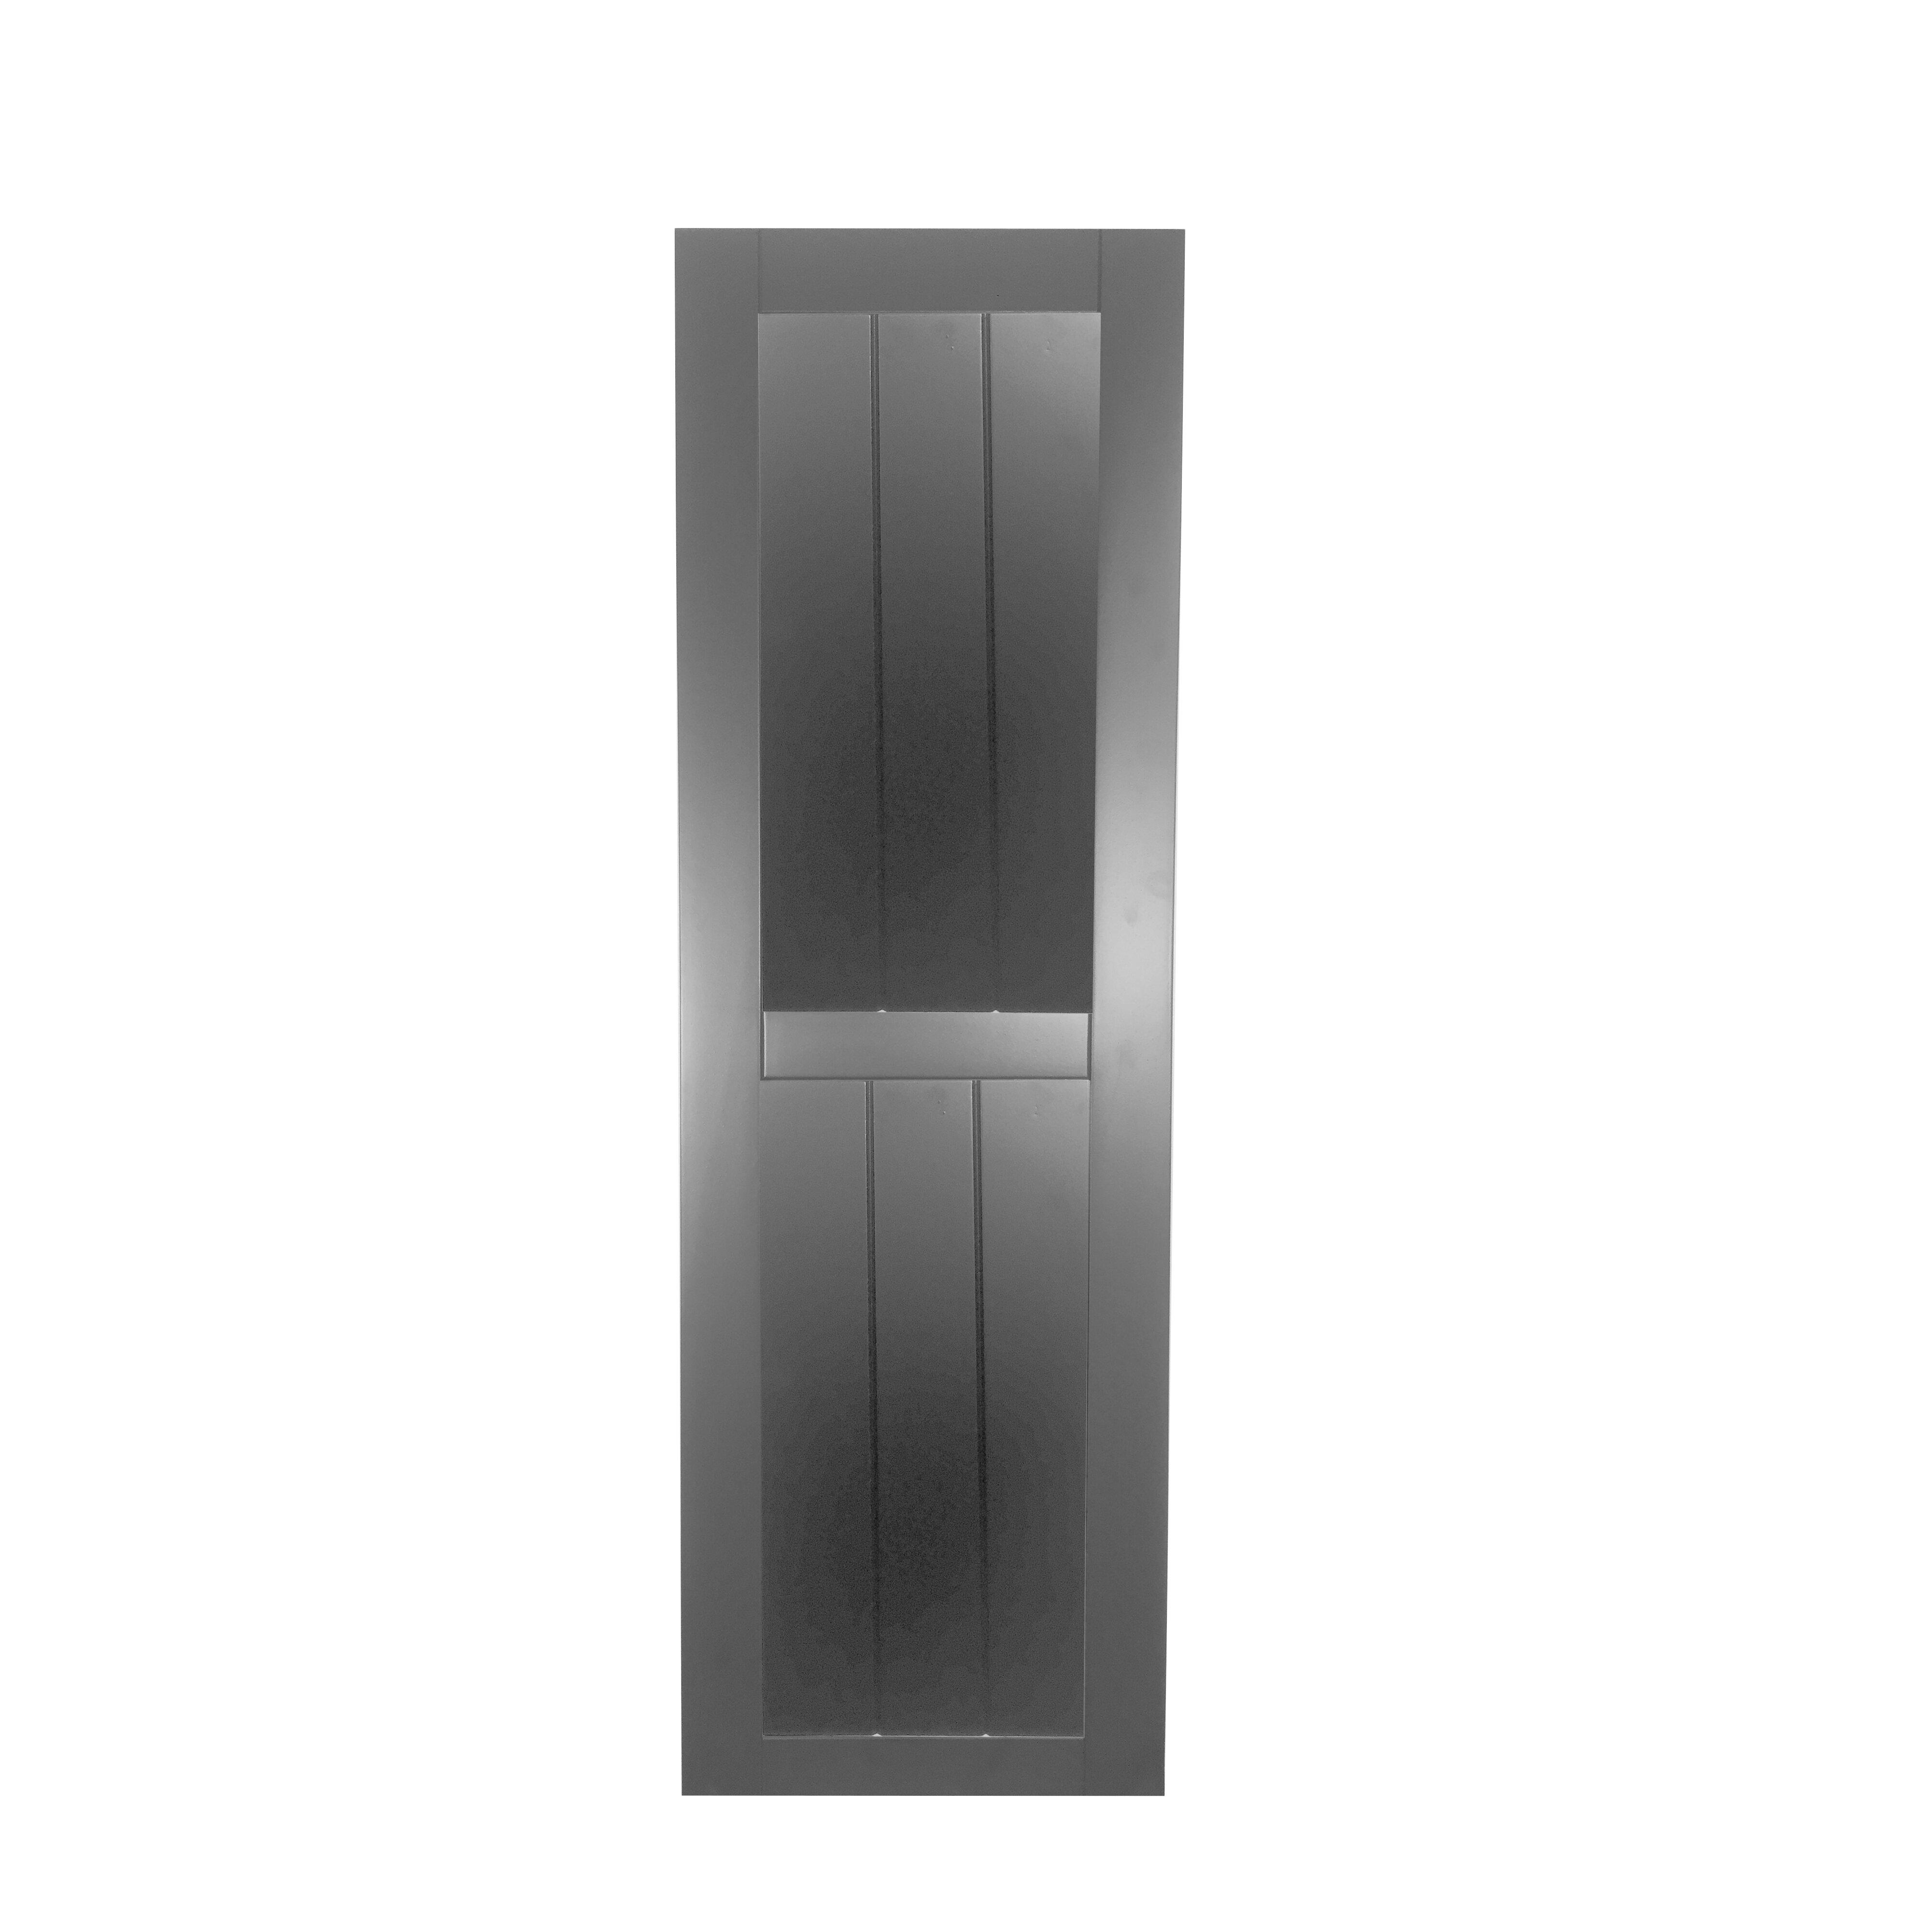 Shutters by design rockbridge framed board and batten - Framed board and batten exterior shutters ...